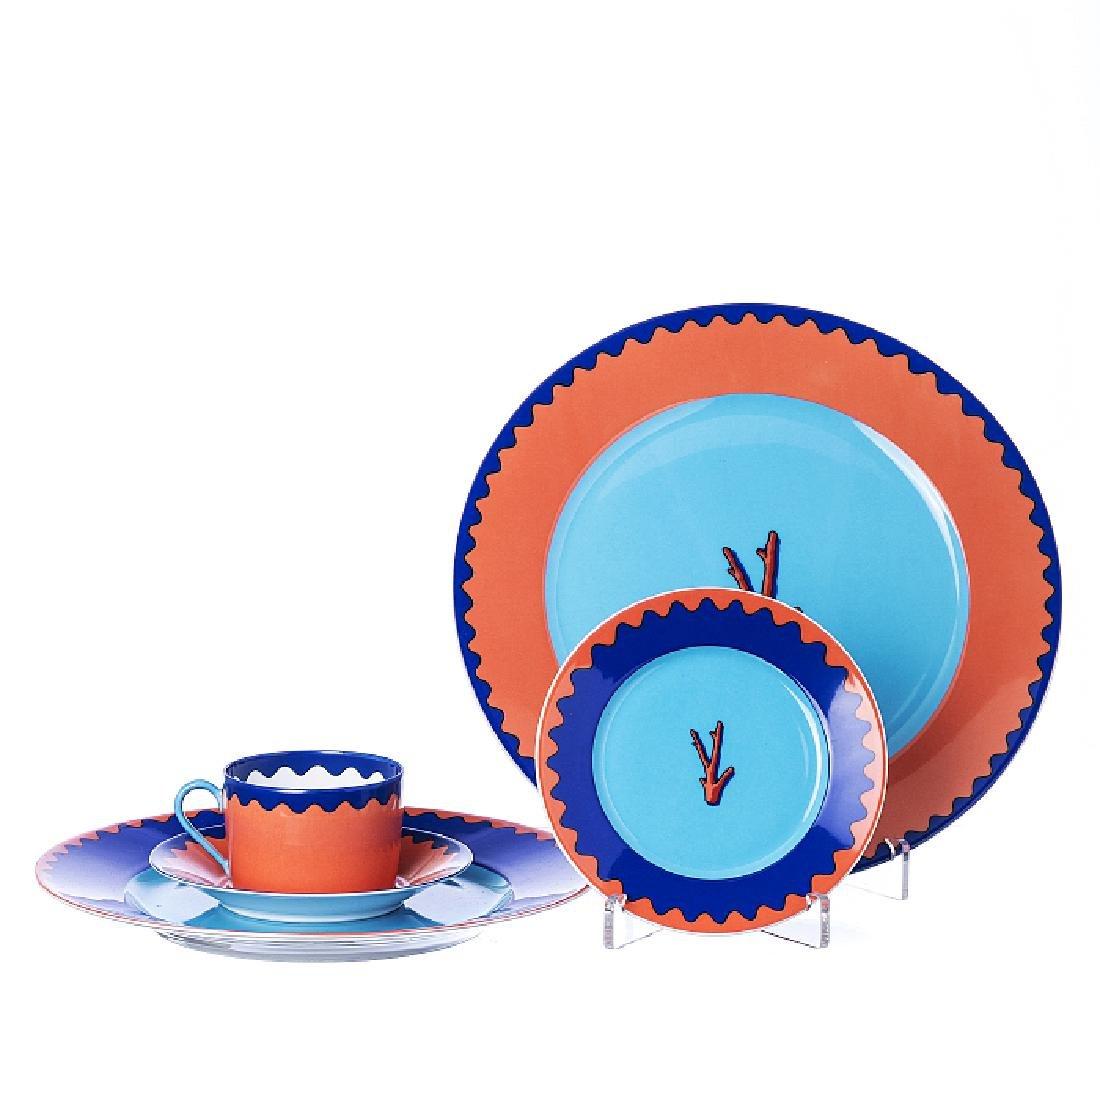 GAROUSTE & BONETTI - Part of a Trapani set in porcelain